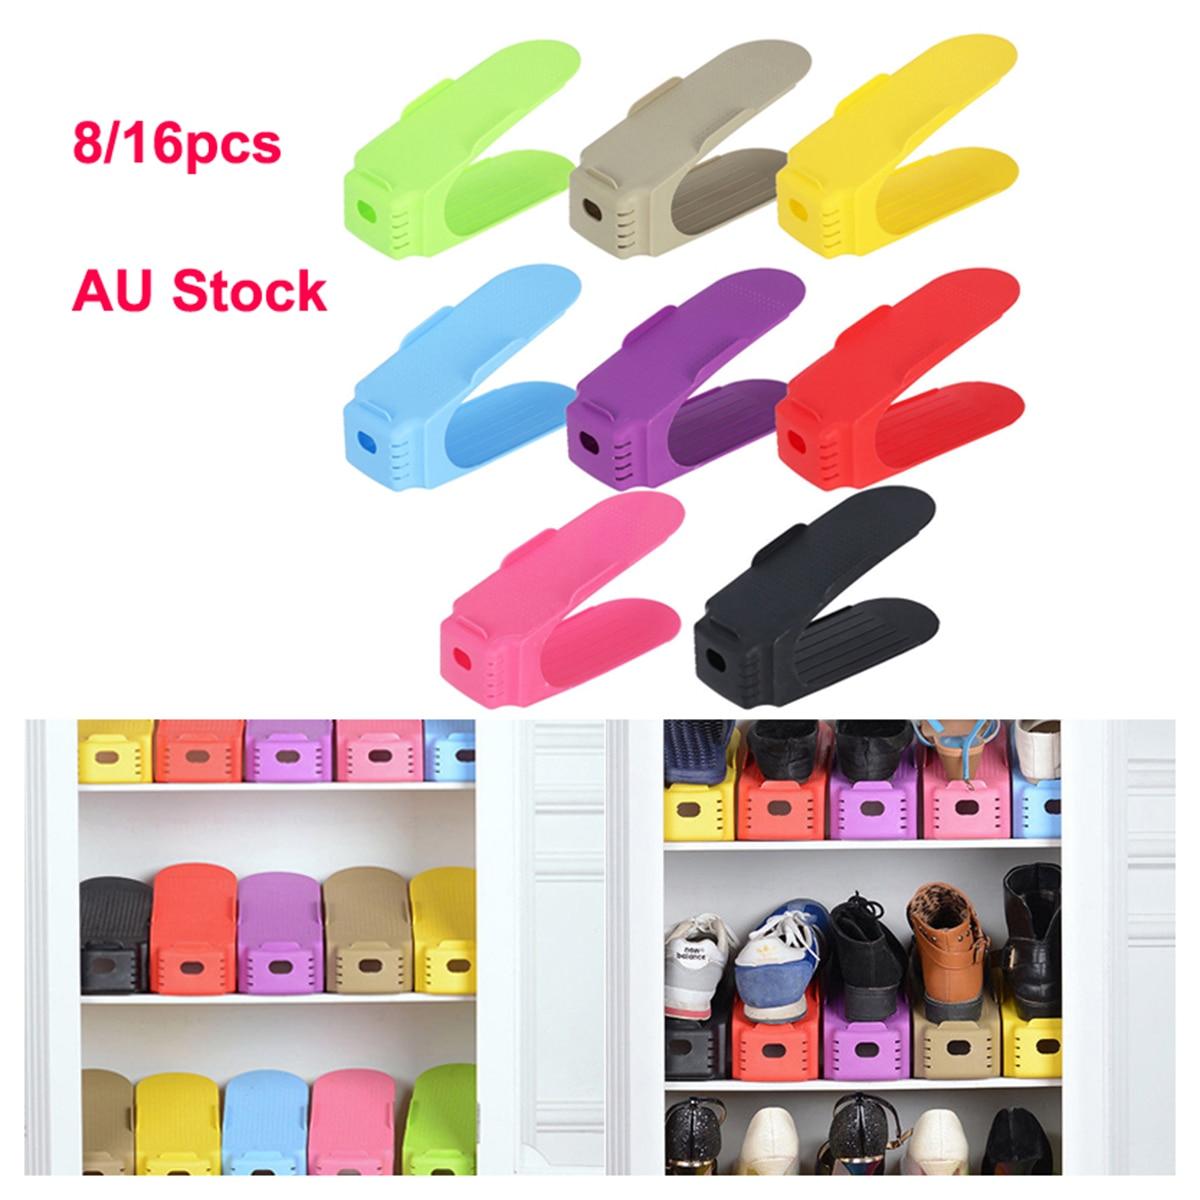 Nice 8pcs Durable Plastic Shoe Organizer Detached Double-wide Shoe Storage Rack Modern Cleaning Storage Shoes Rack Clothing & Wardrobe Storage